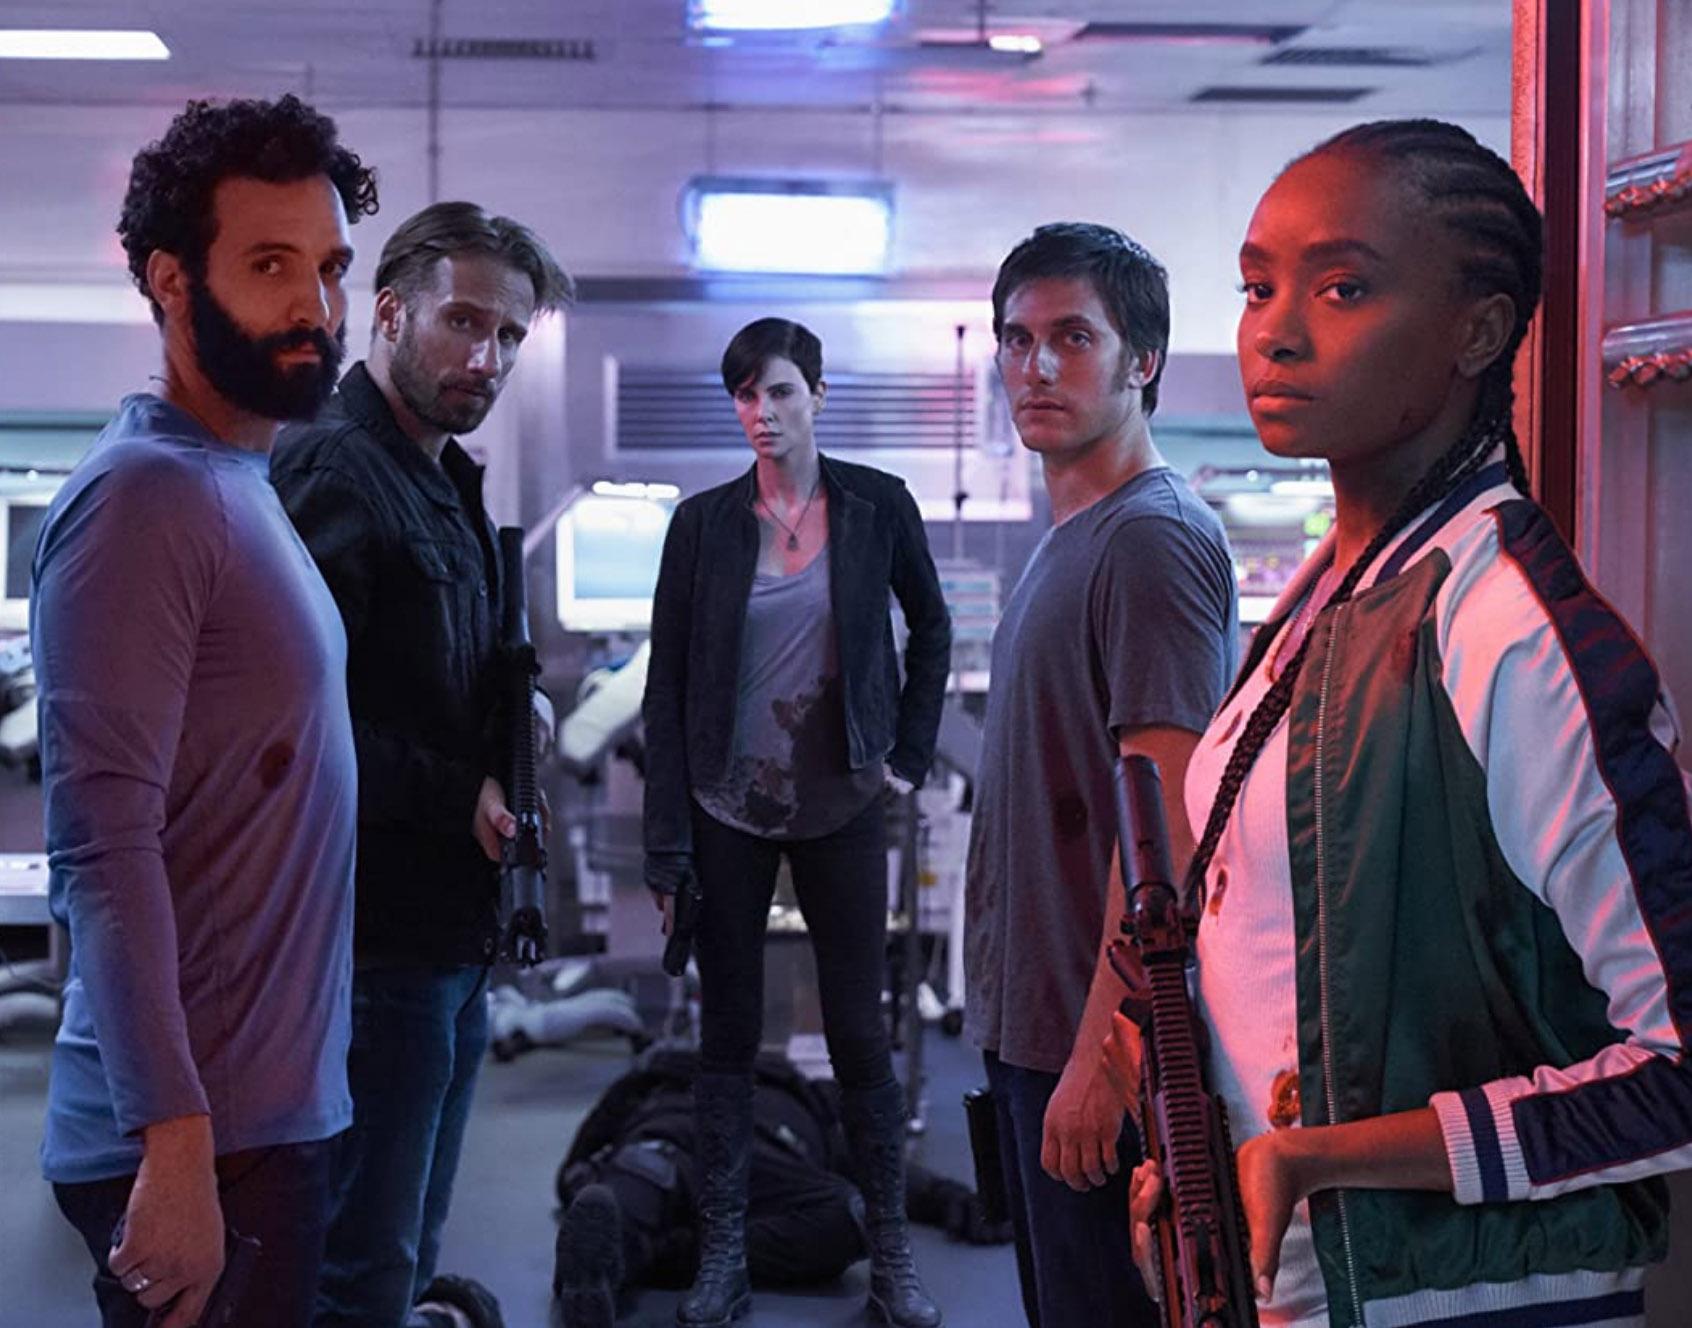 Charlize Theron,Matthias Schoenaerts,Luca Marinelli,Marwan Kenzari ogKiKi LayneiThe Old Guard (Netflix)